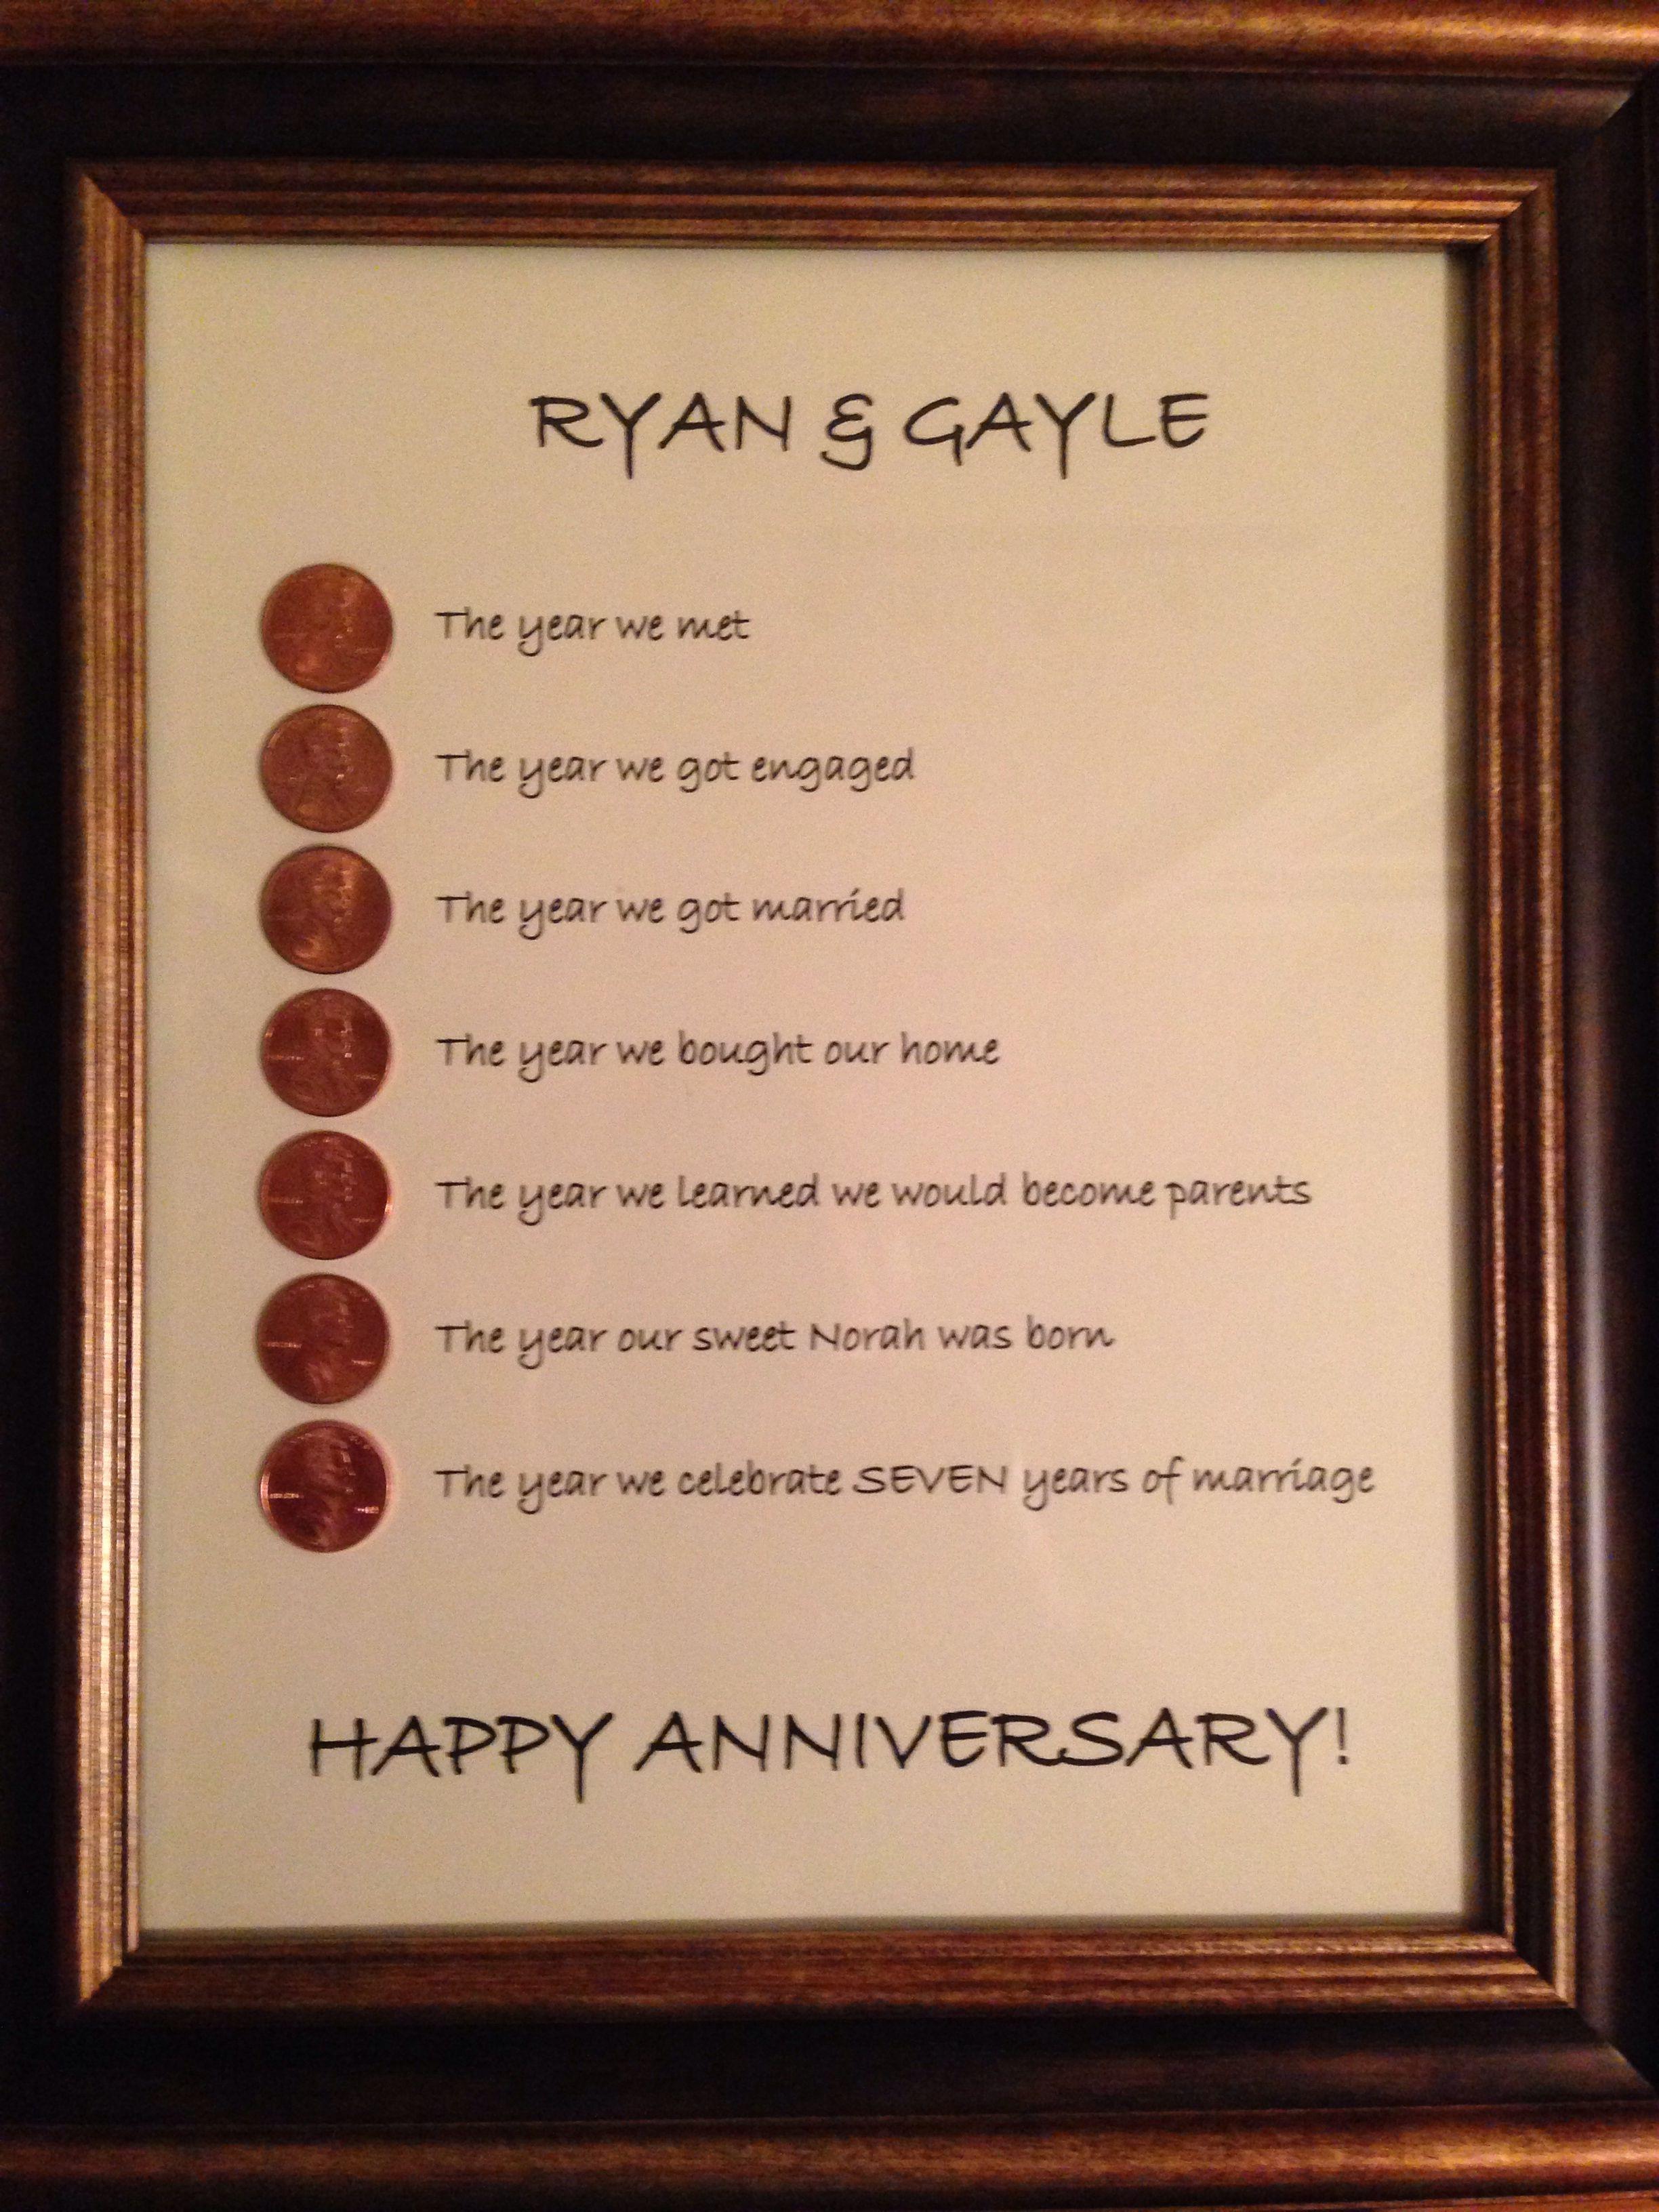 7 year anniversary 7 year anniversary, 8 year